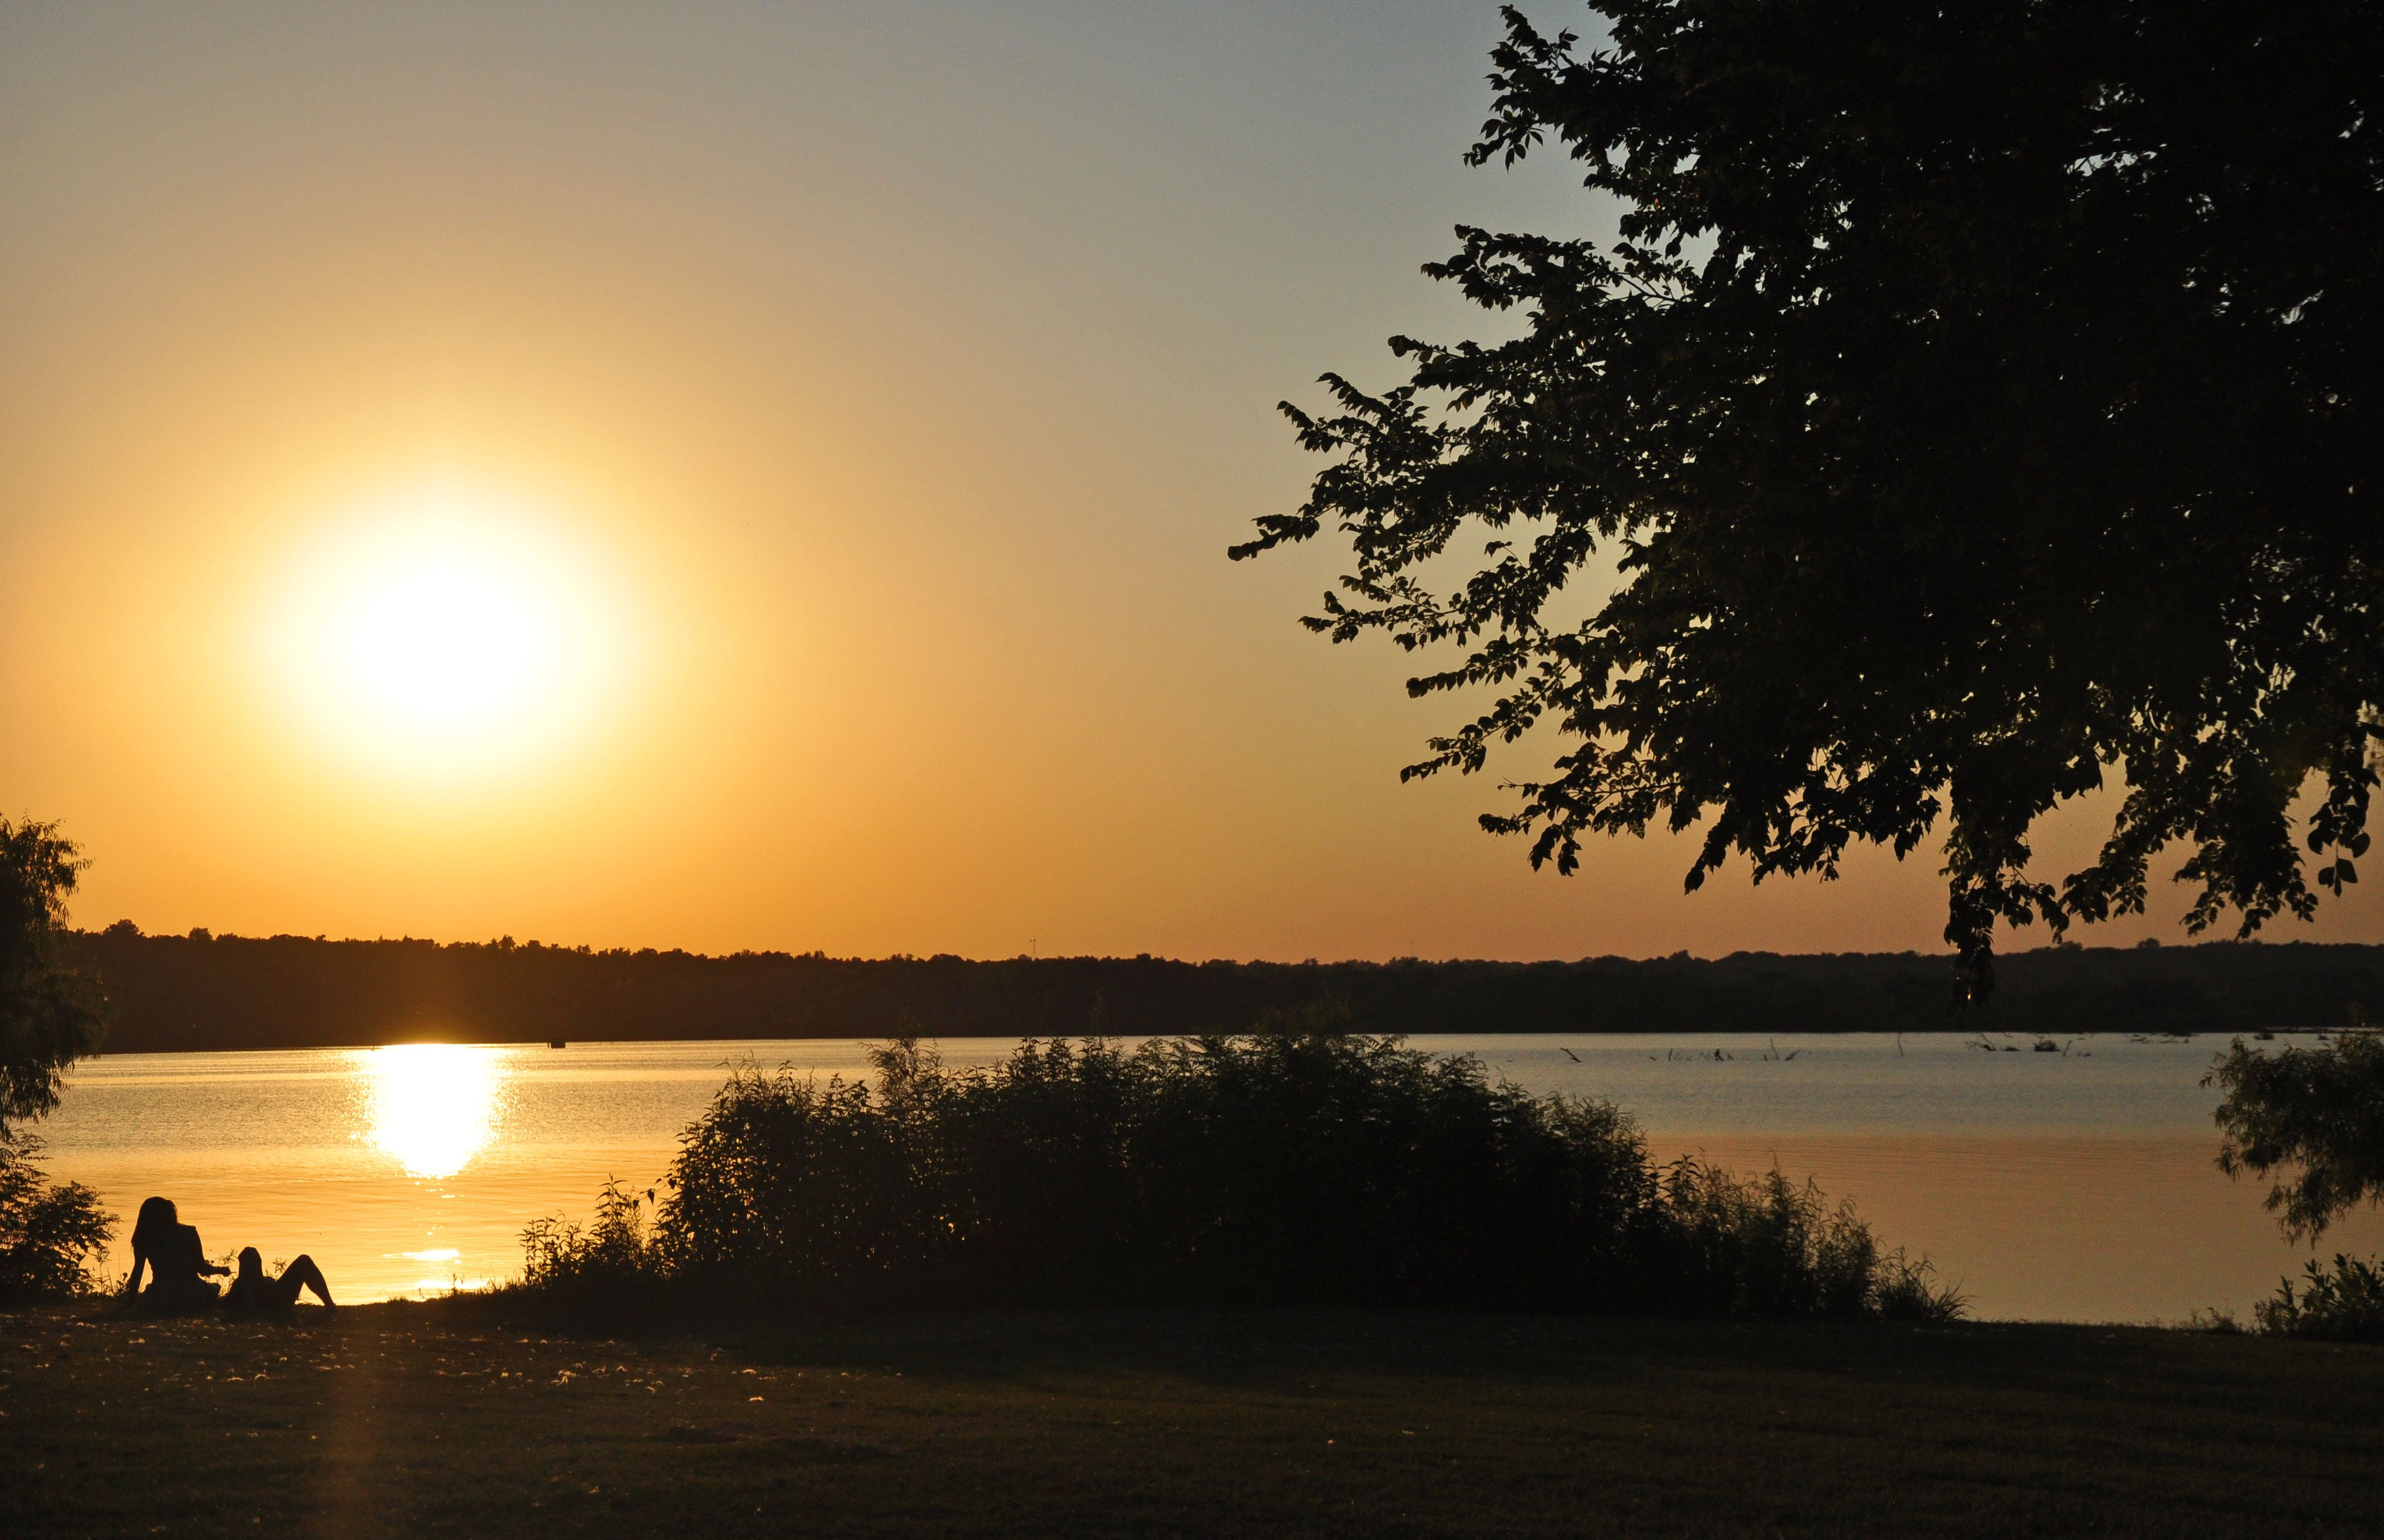 Lake thunderbird norman oklahoma cant wait until